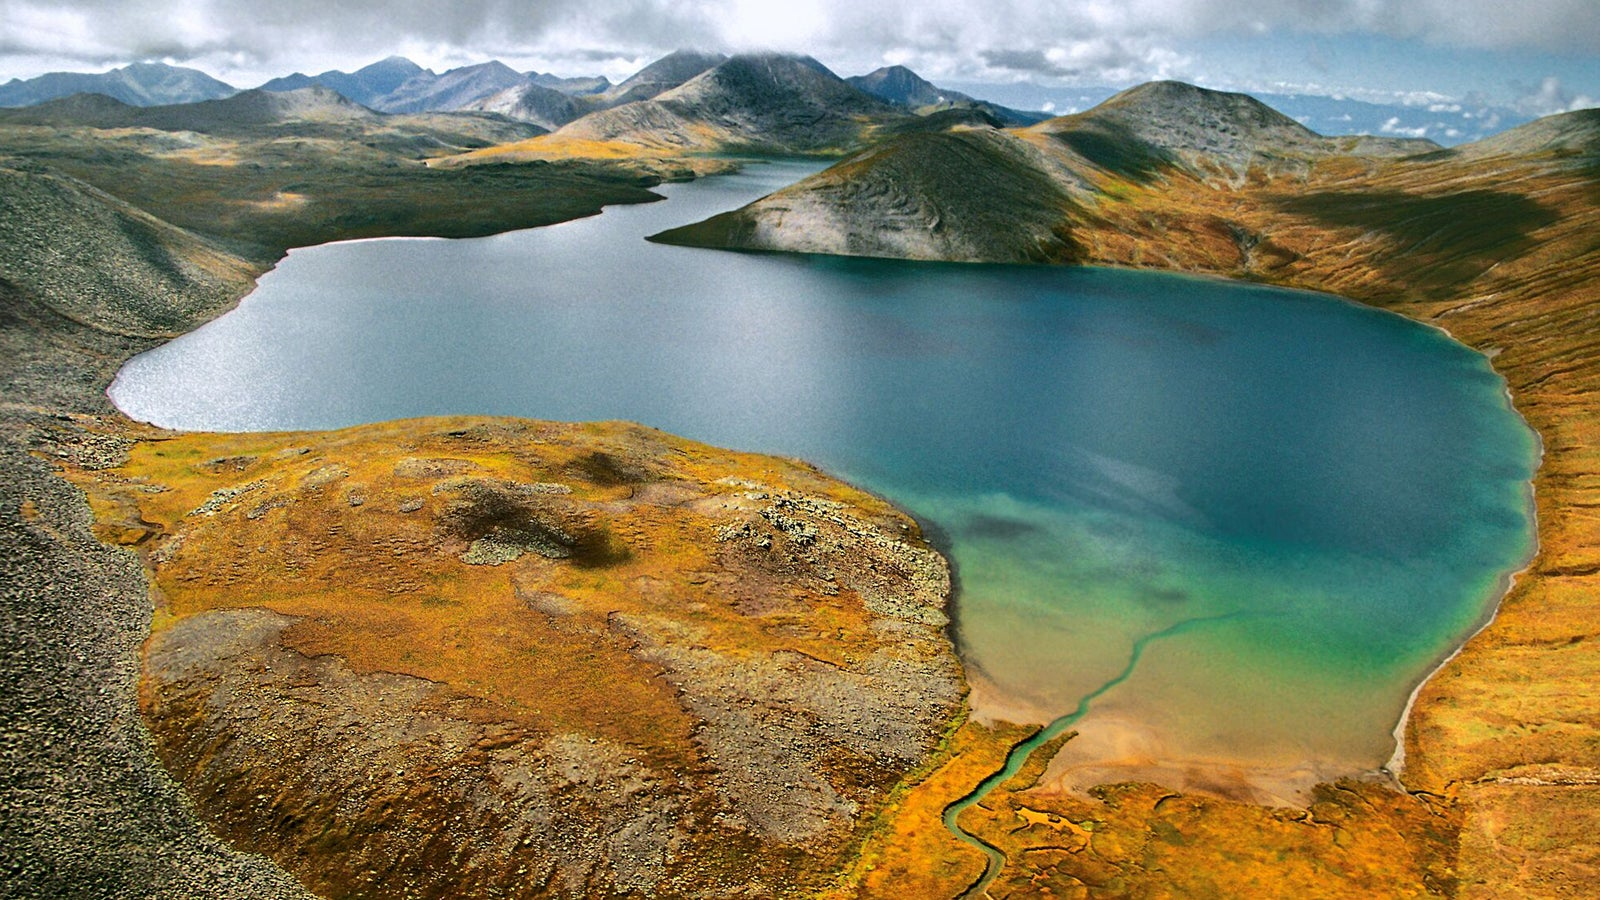 Keli lake